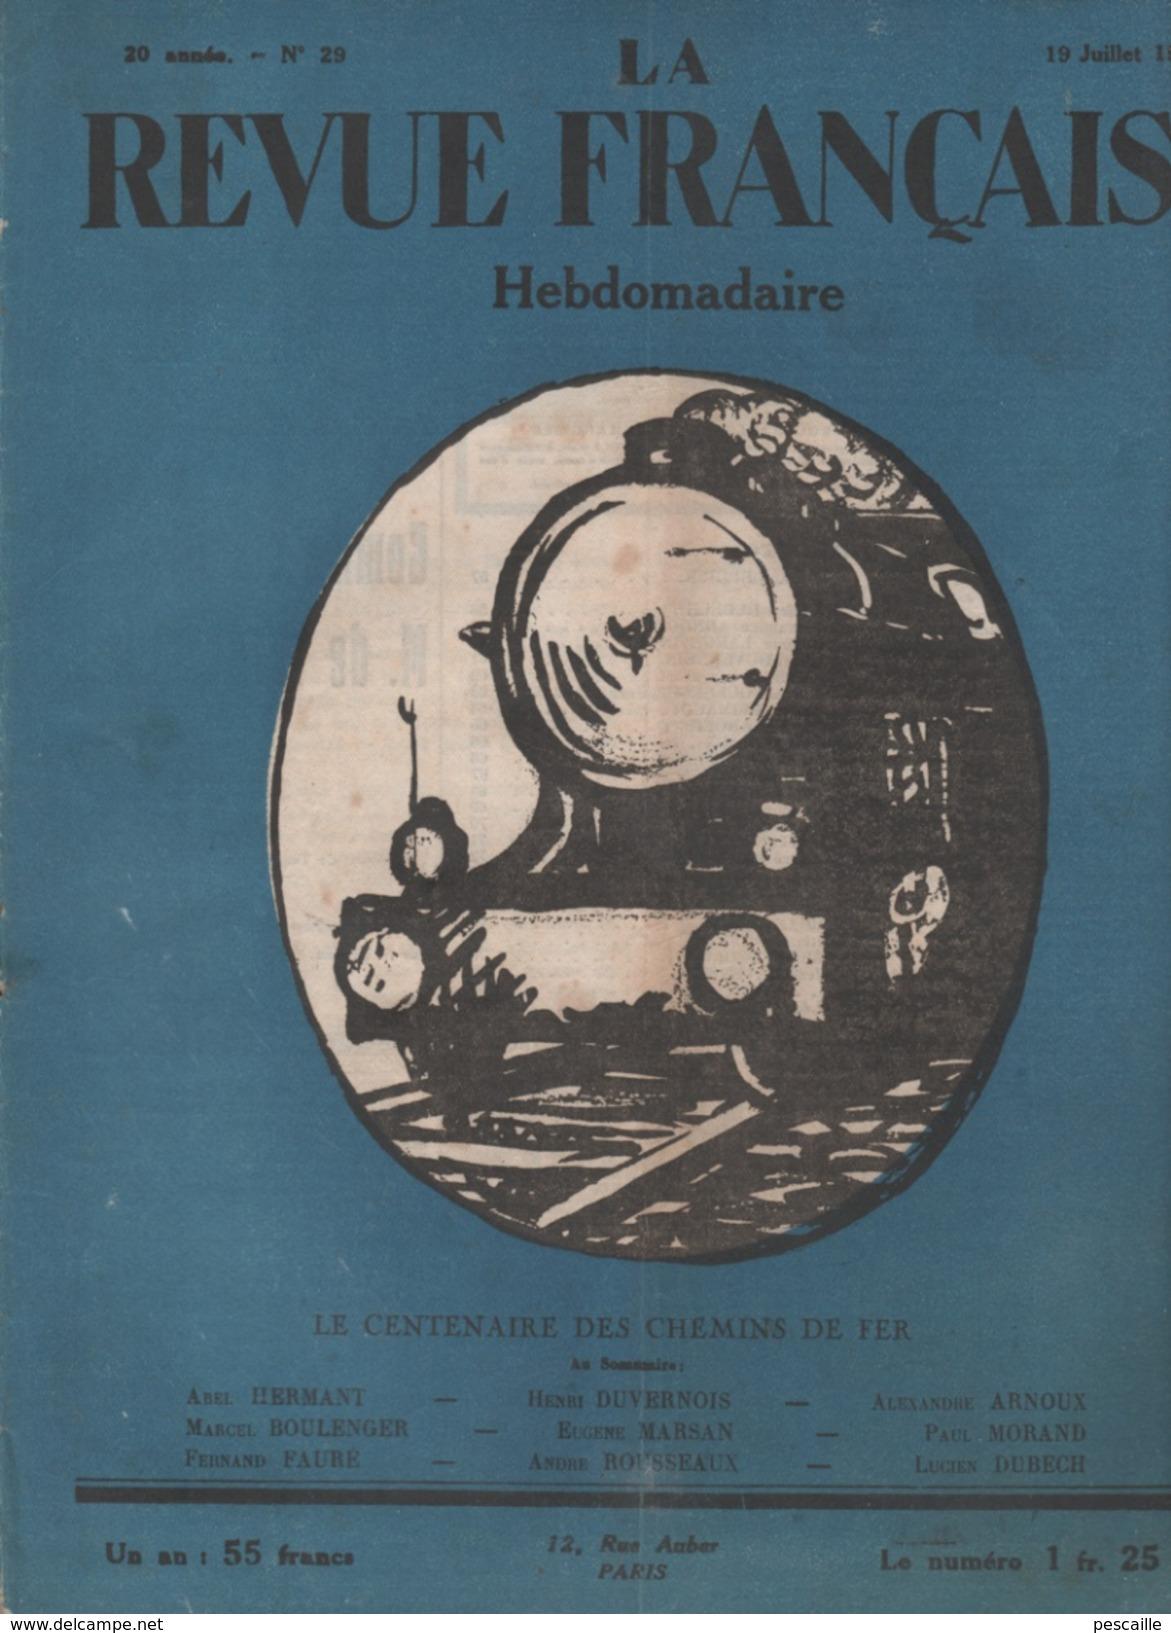 LA REVUE FRANCAISE 19 07 1925 - CHEMINS DE FER - PERCEE DU SIMPLON - GRANDS EXPRESS - ETALON OR - - Giornali